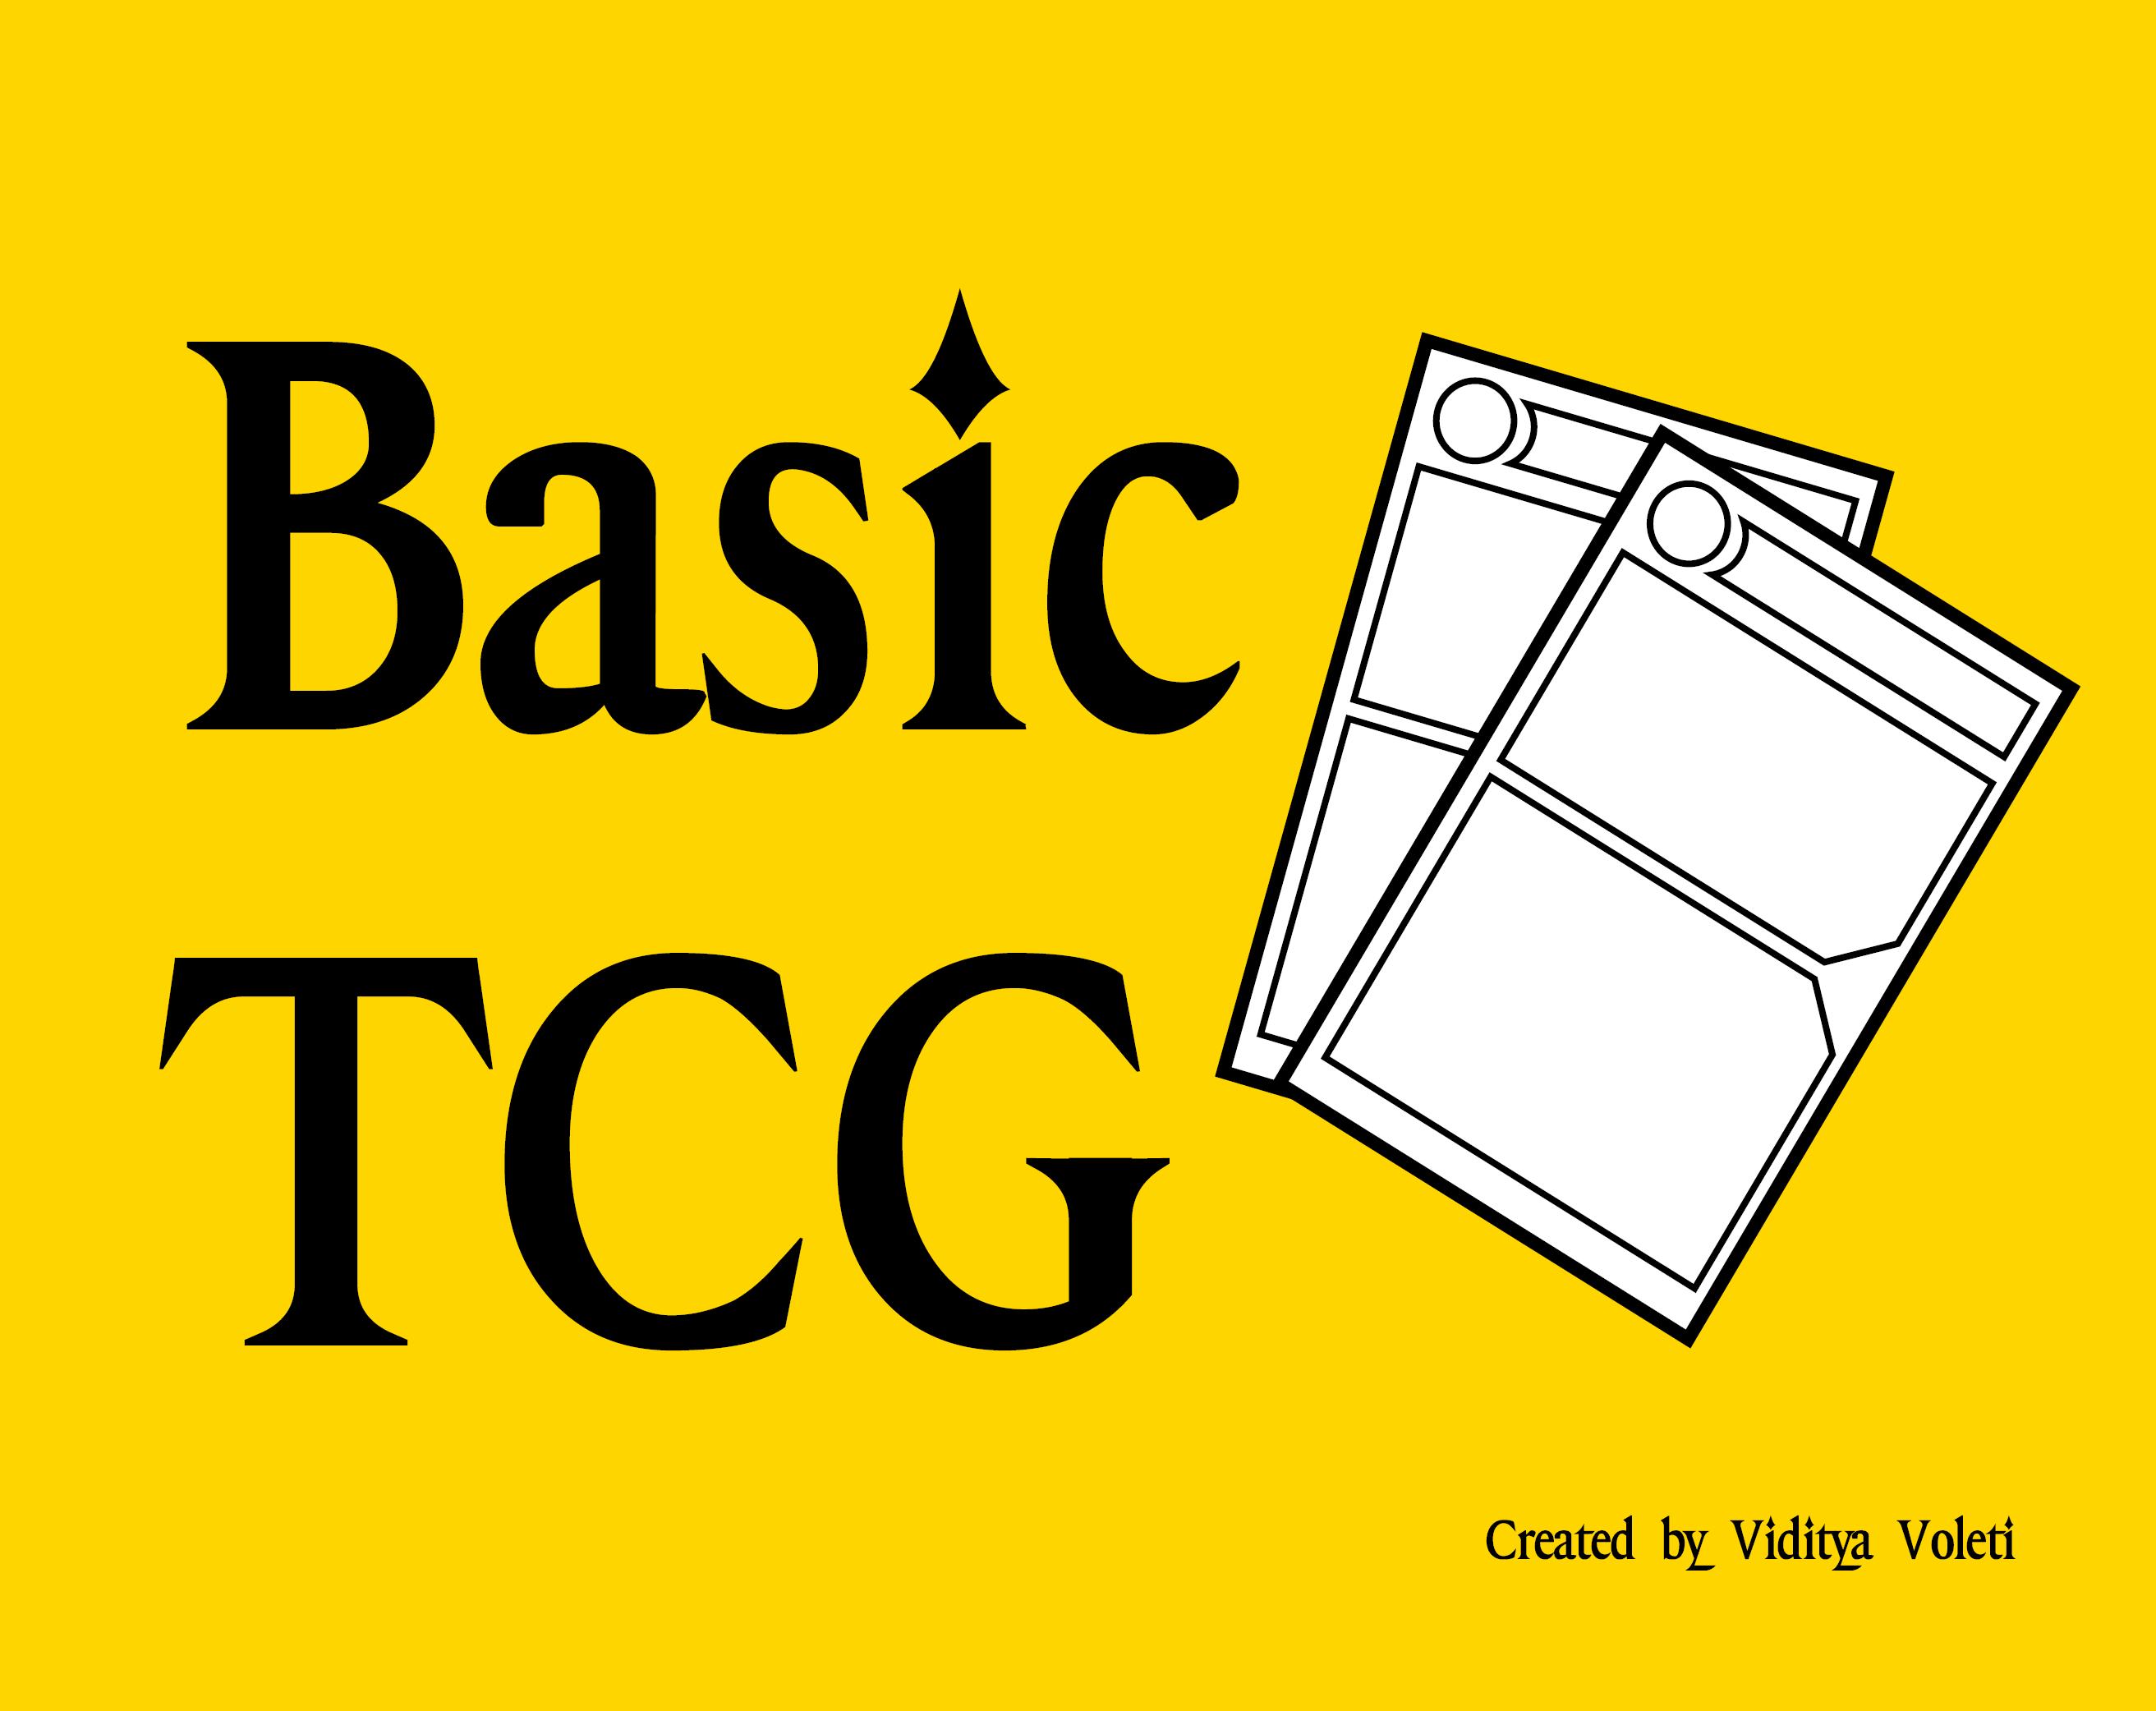 Basic TCG